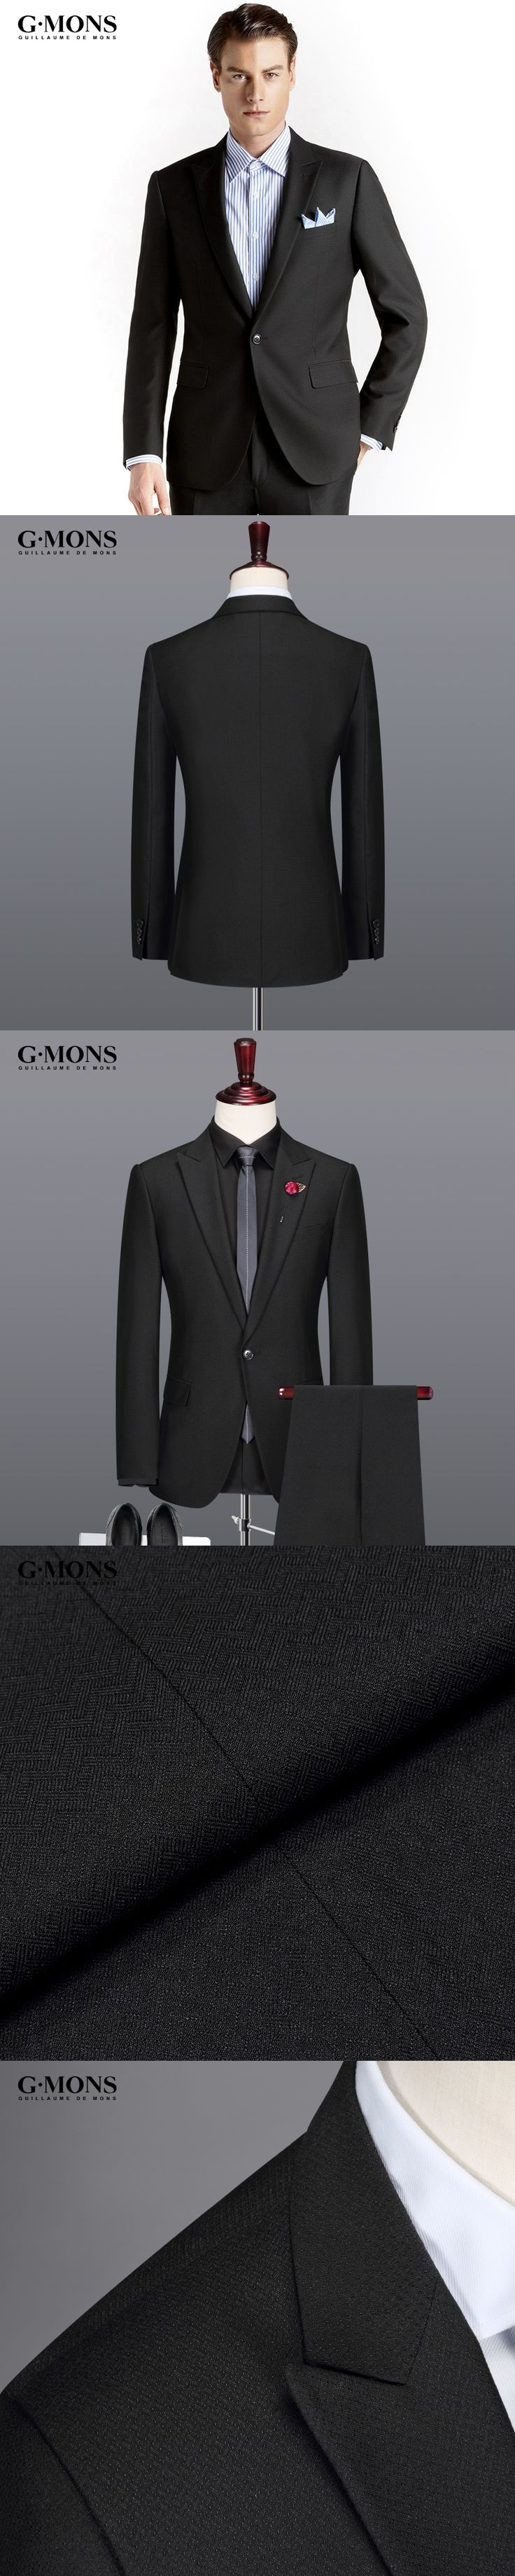 men suit fashion black new arrivals business casual groom wedding wear single breasted summer autumn latest coat pant 2pcs set